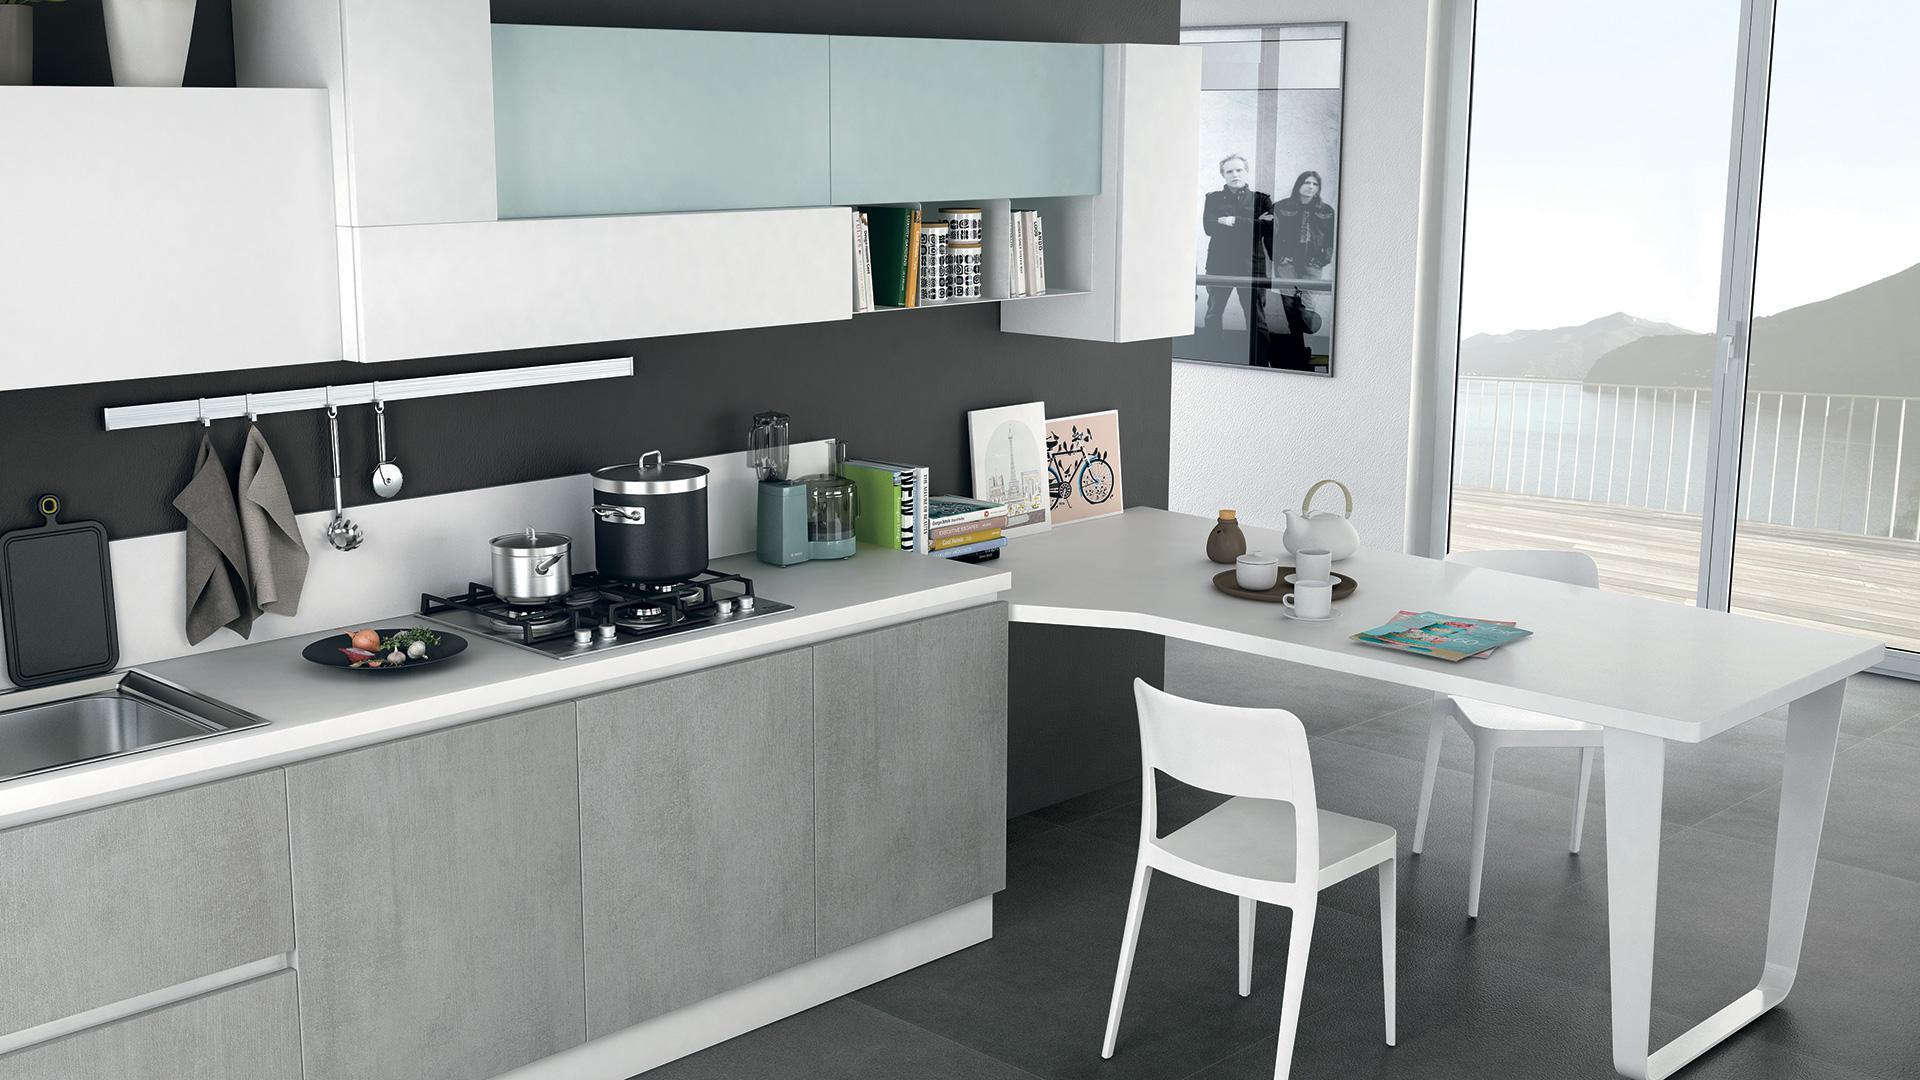 cucina moderna lube immagina plus nardò e lecce